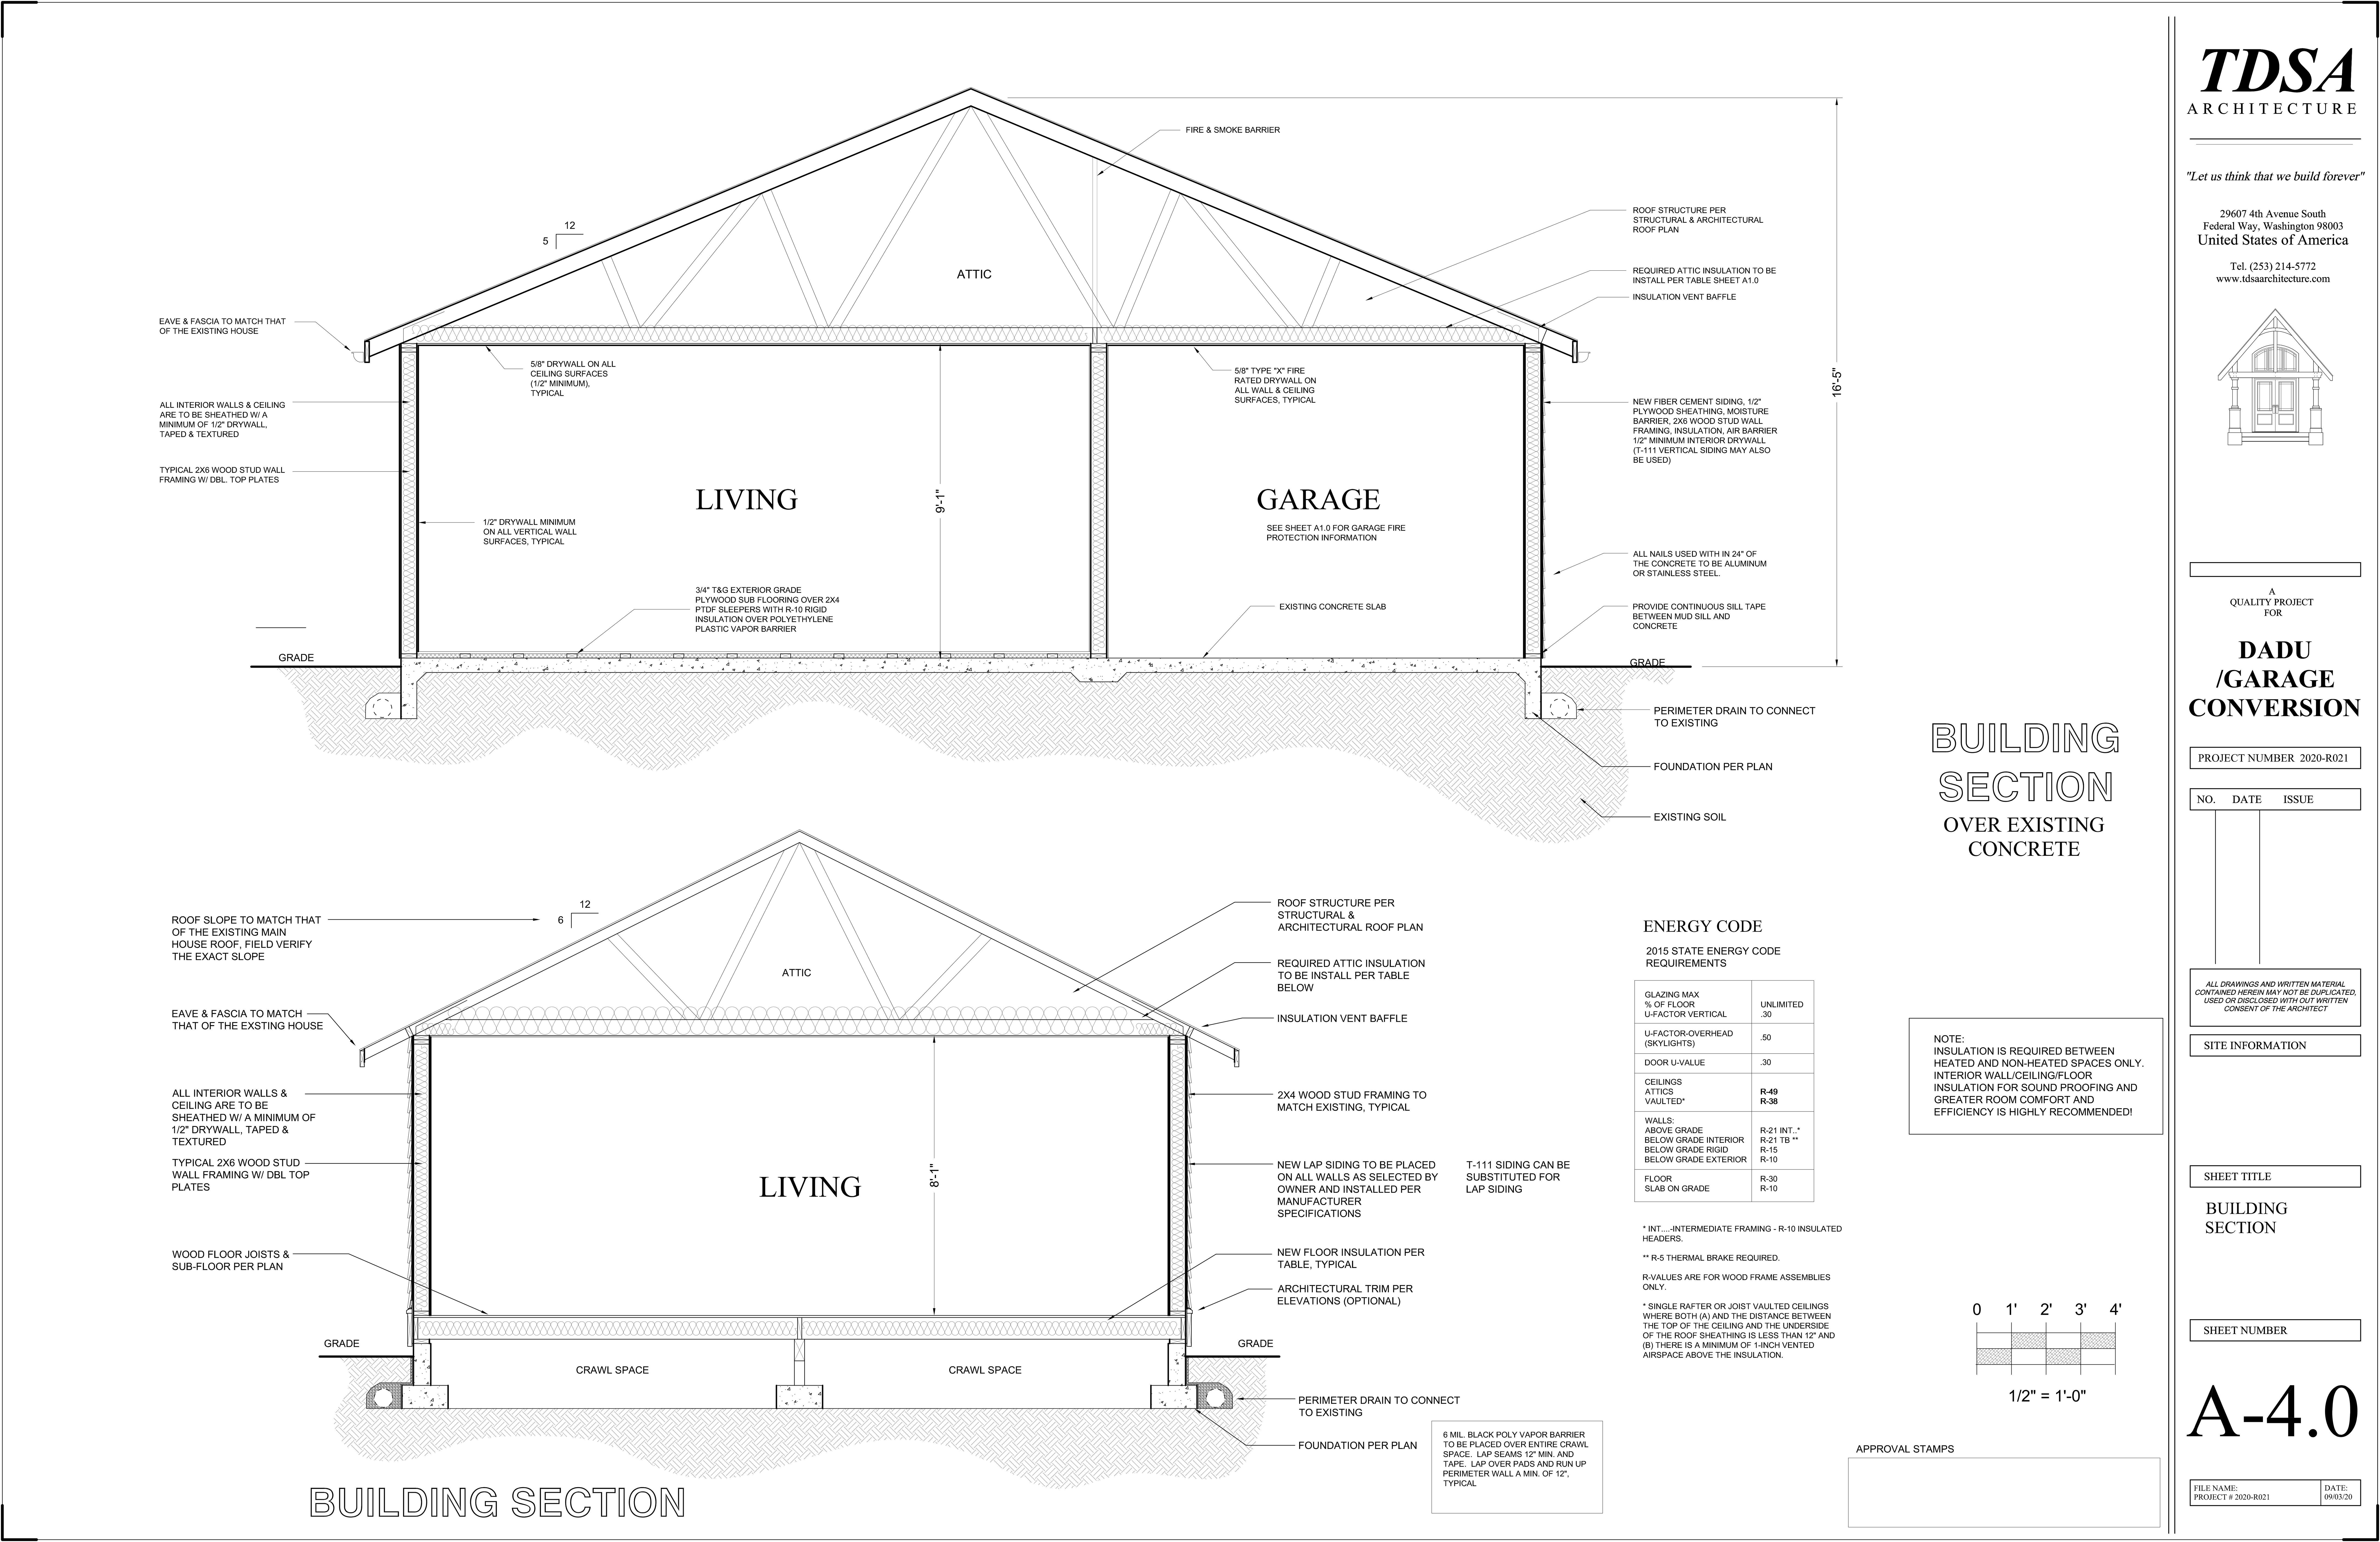 TDSA LVING-GARAGE SECTION 11-10-2020